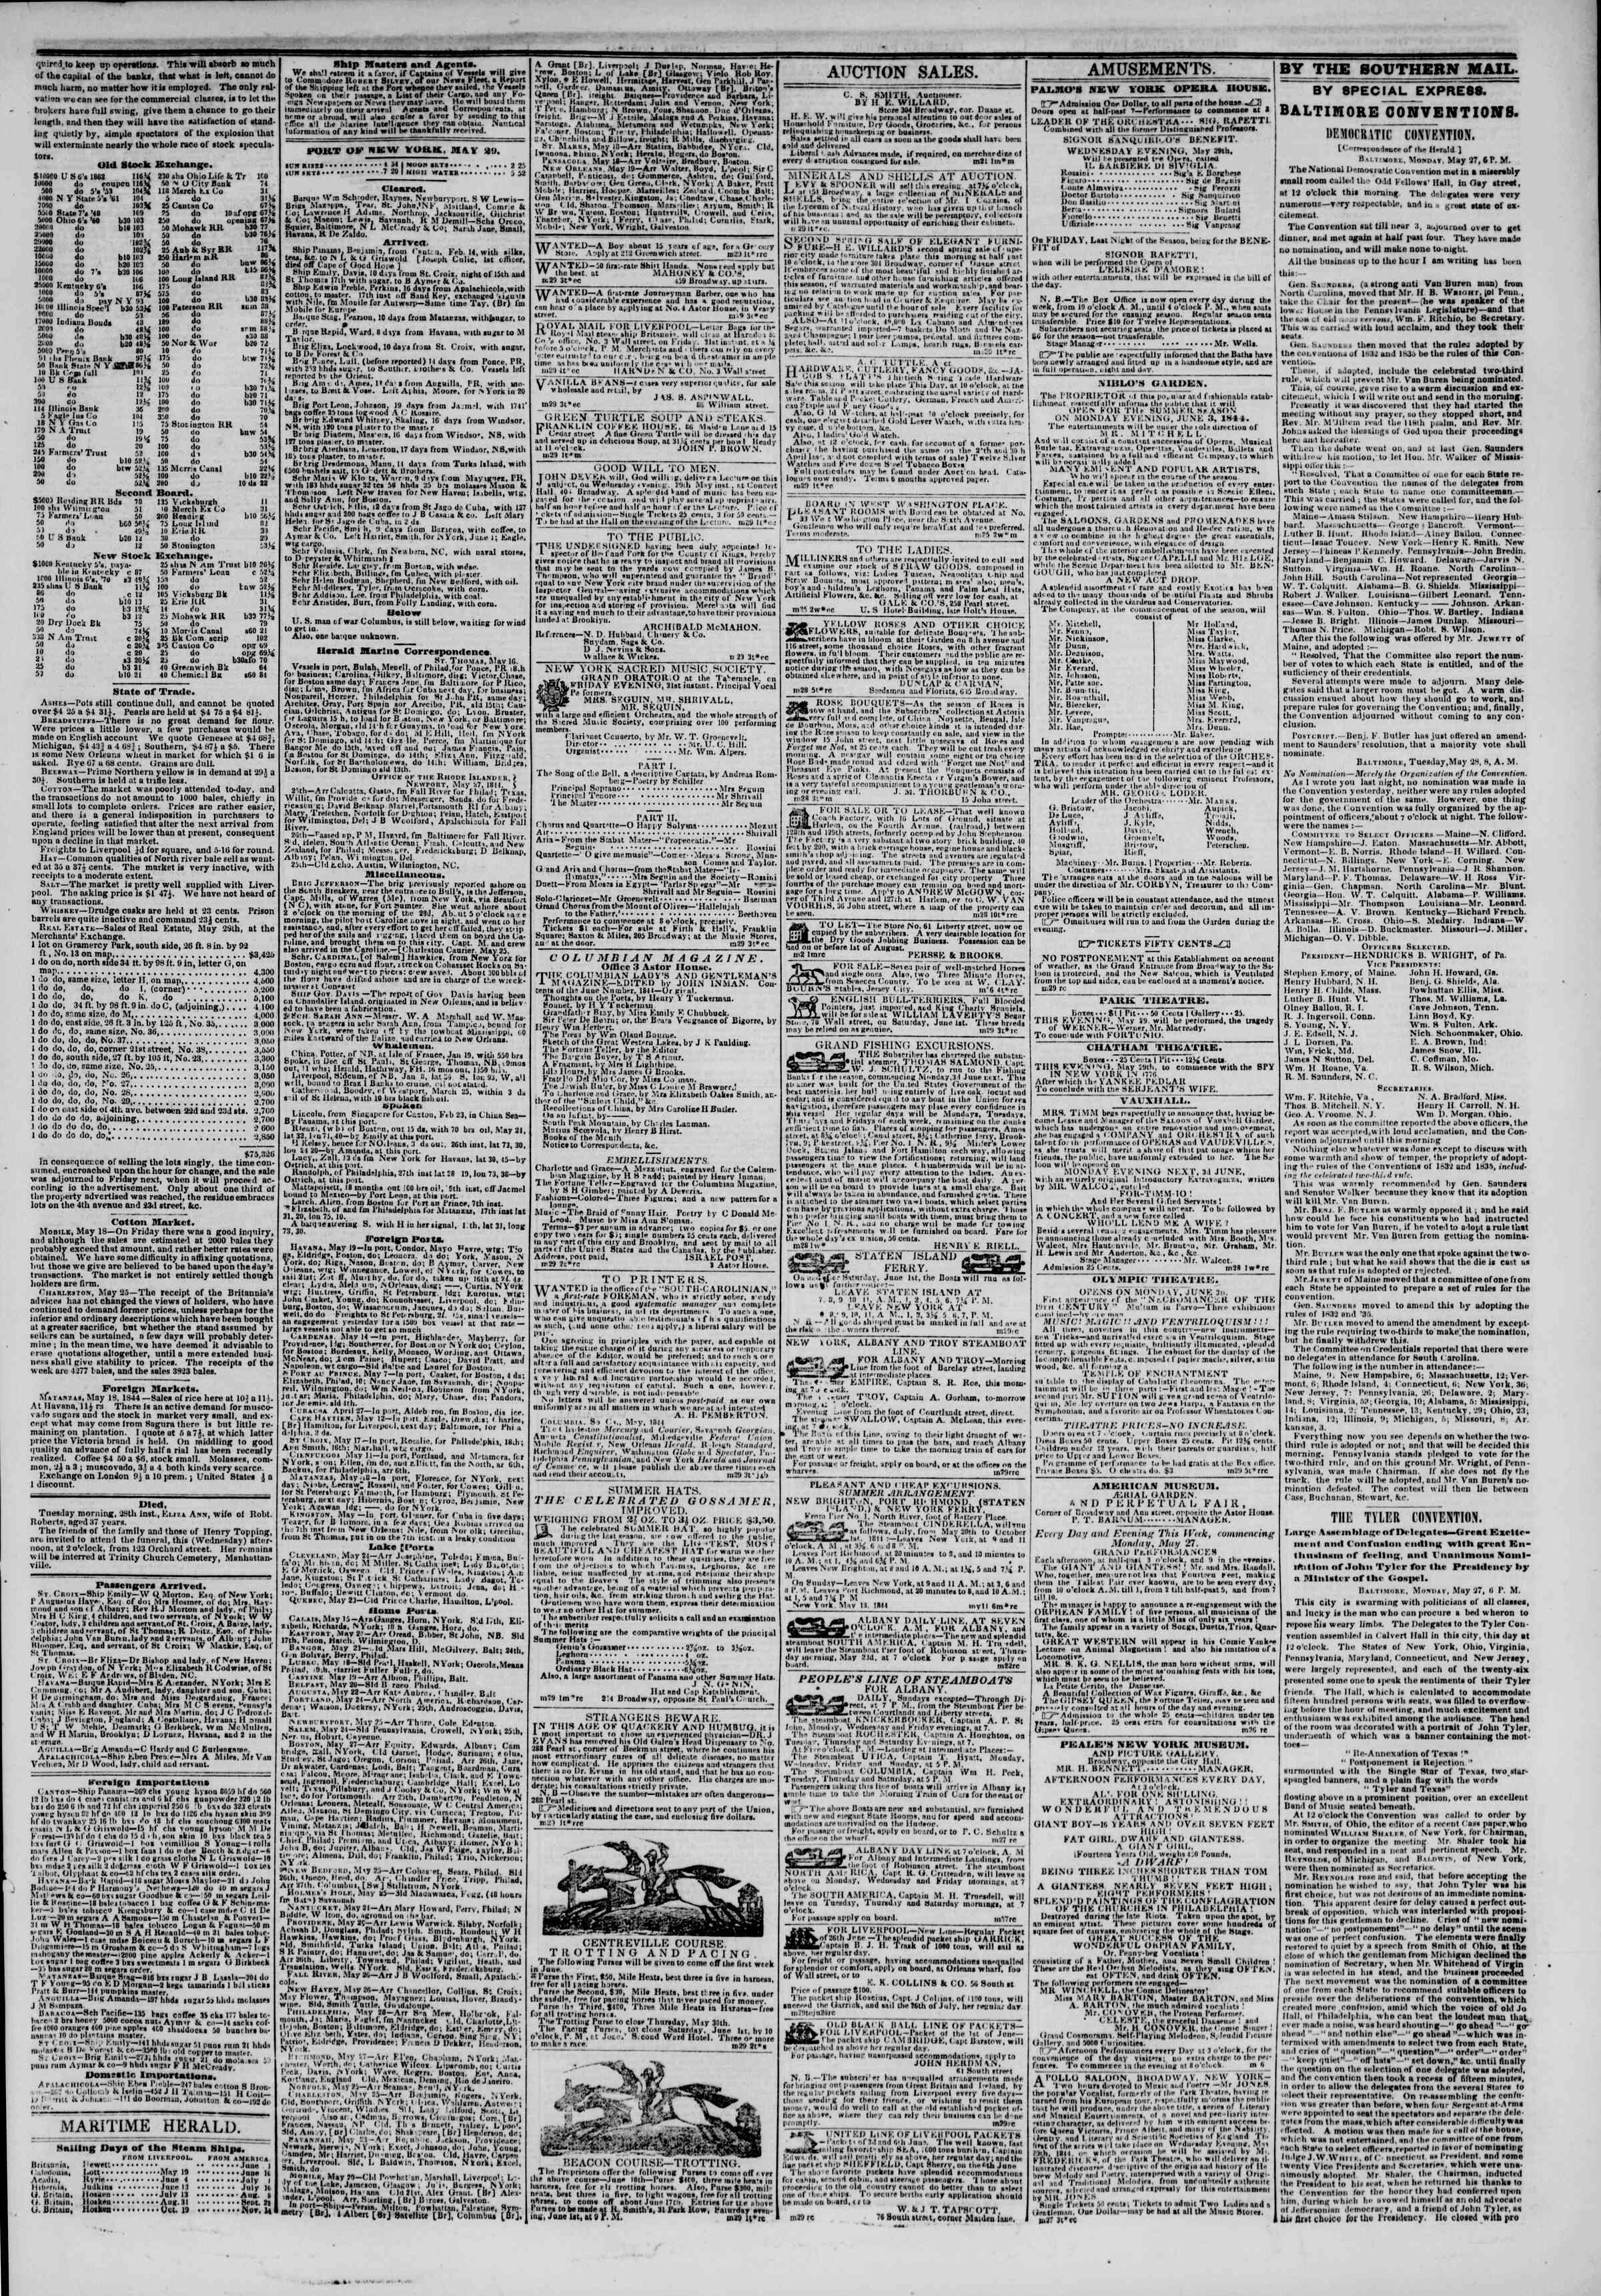 May 29, 1844 Tarihli The New York Herald Gazetesi Sayfa 3